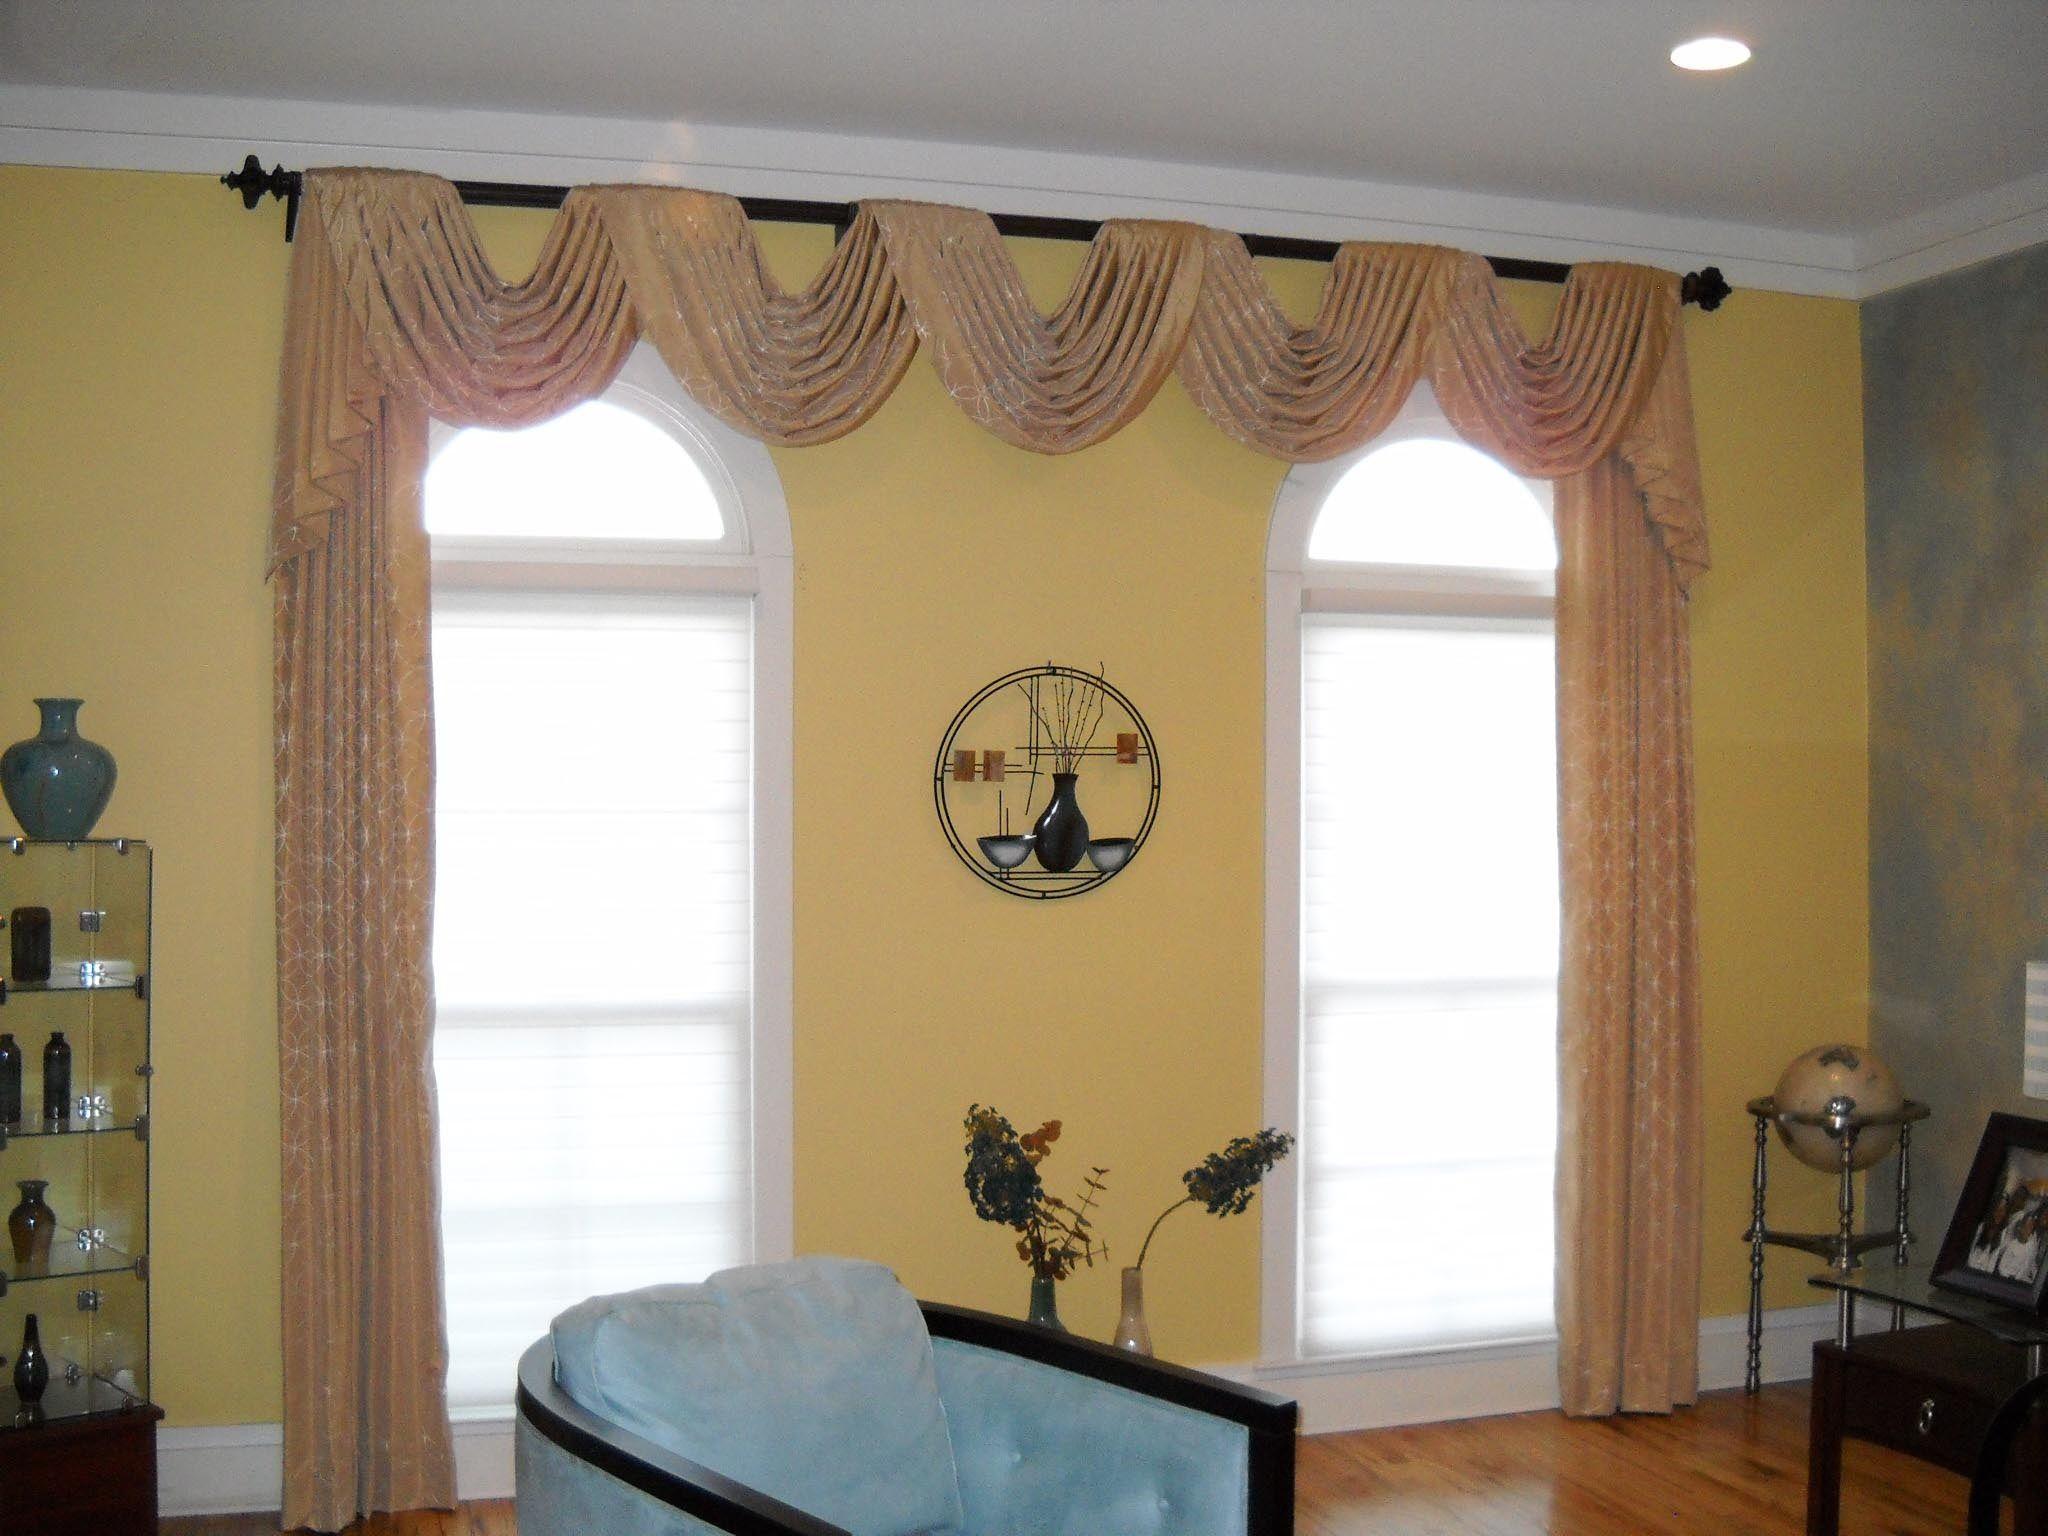 Windowtreatments Pole Swags Panels Treating 2 Single Windows As